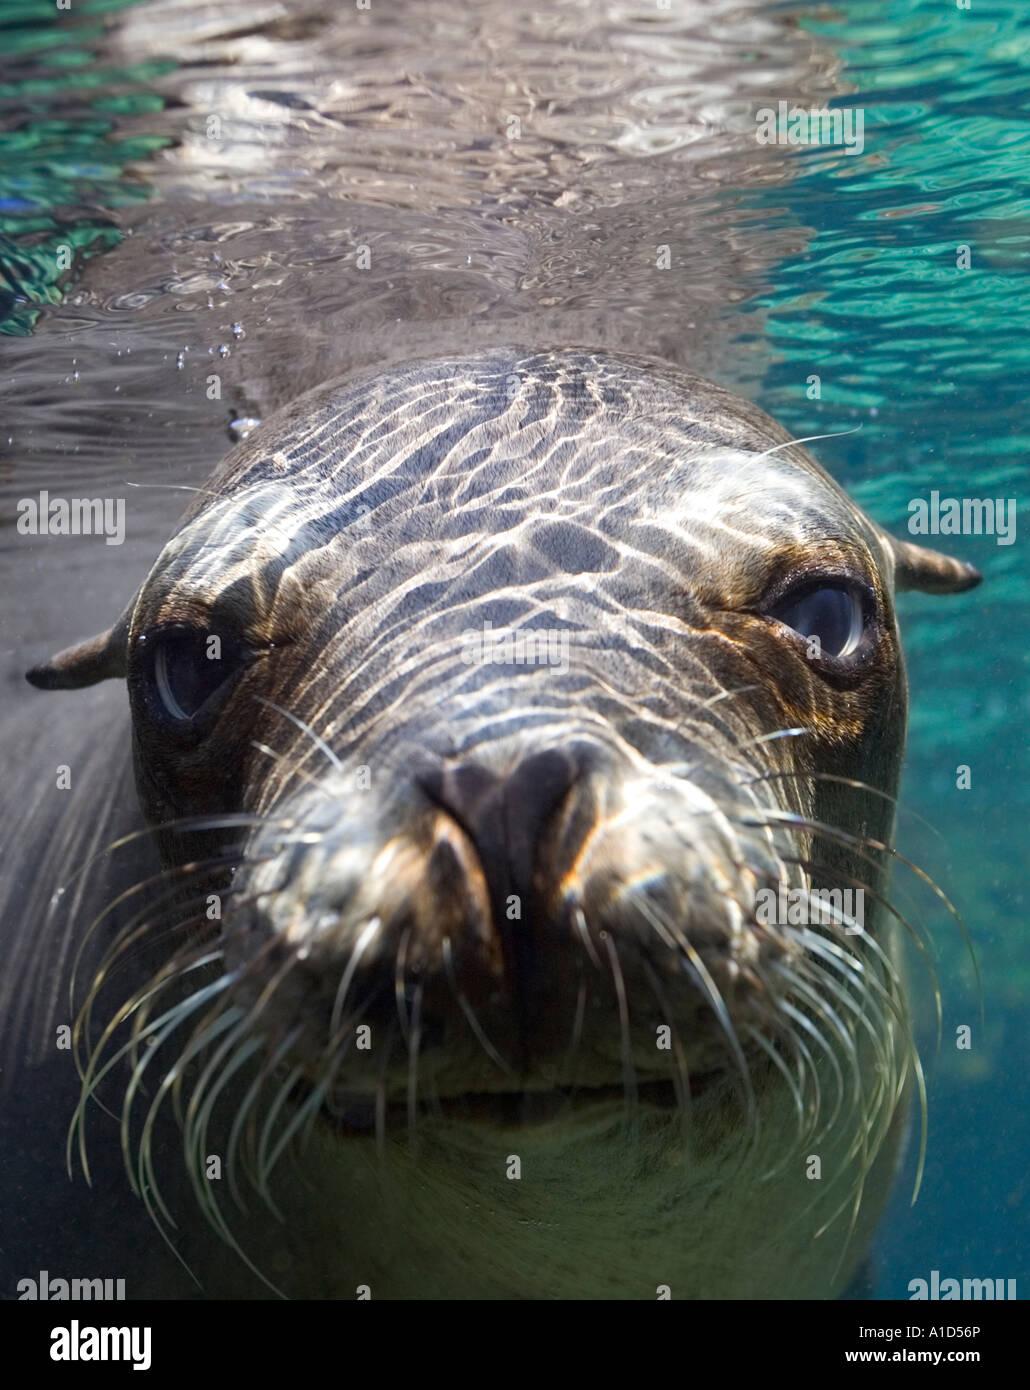 nu1874. Galapagos Sea Lion, Zalophus wollebaeki, underwater portrait. Galapagos, Pacific Ocean. Photo Copyright - Stock Image